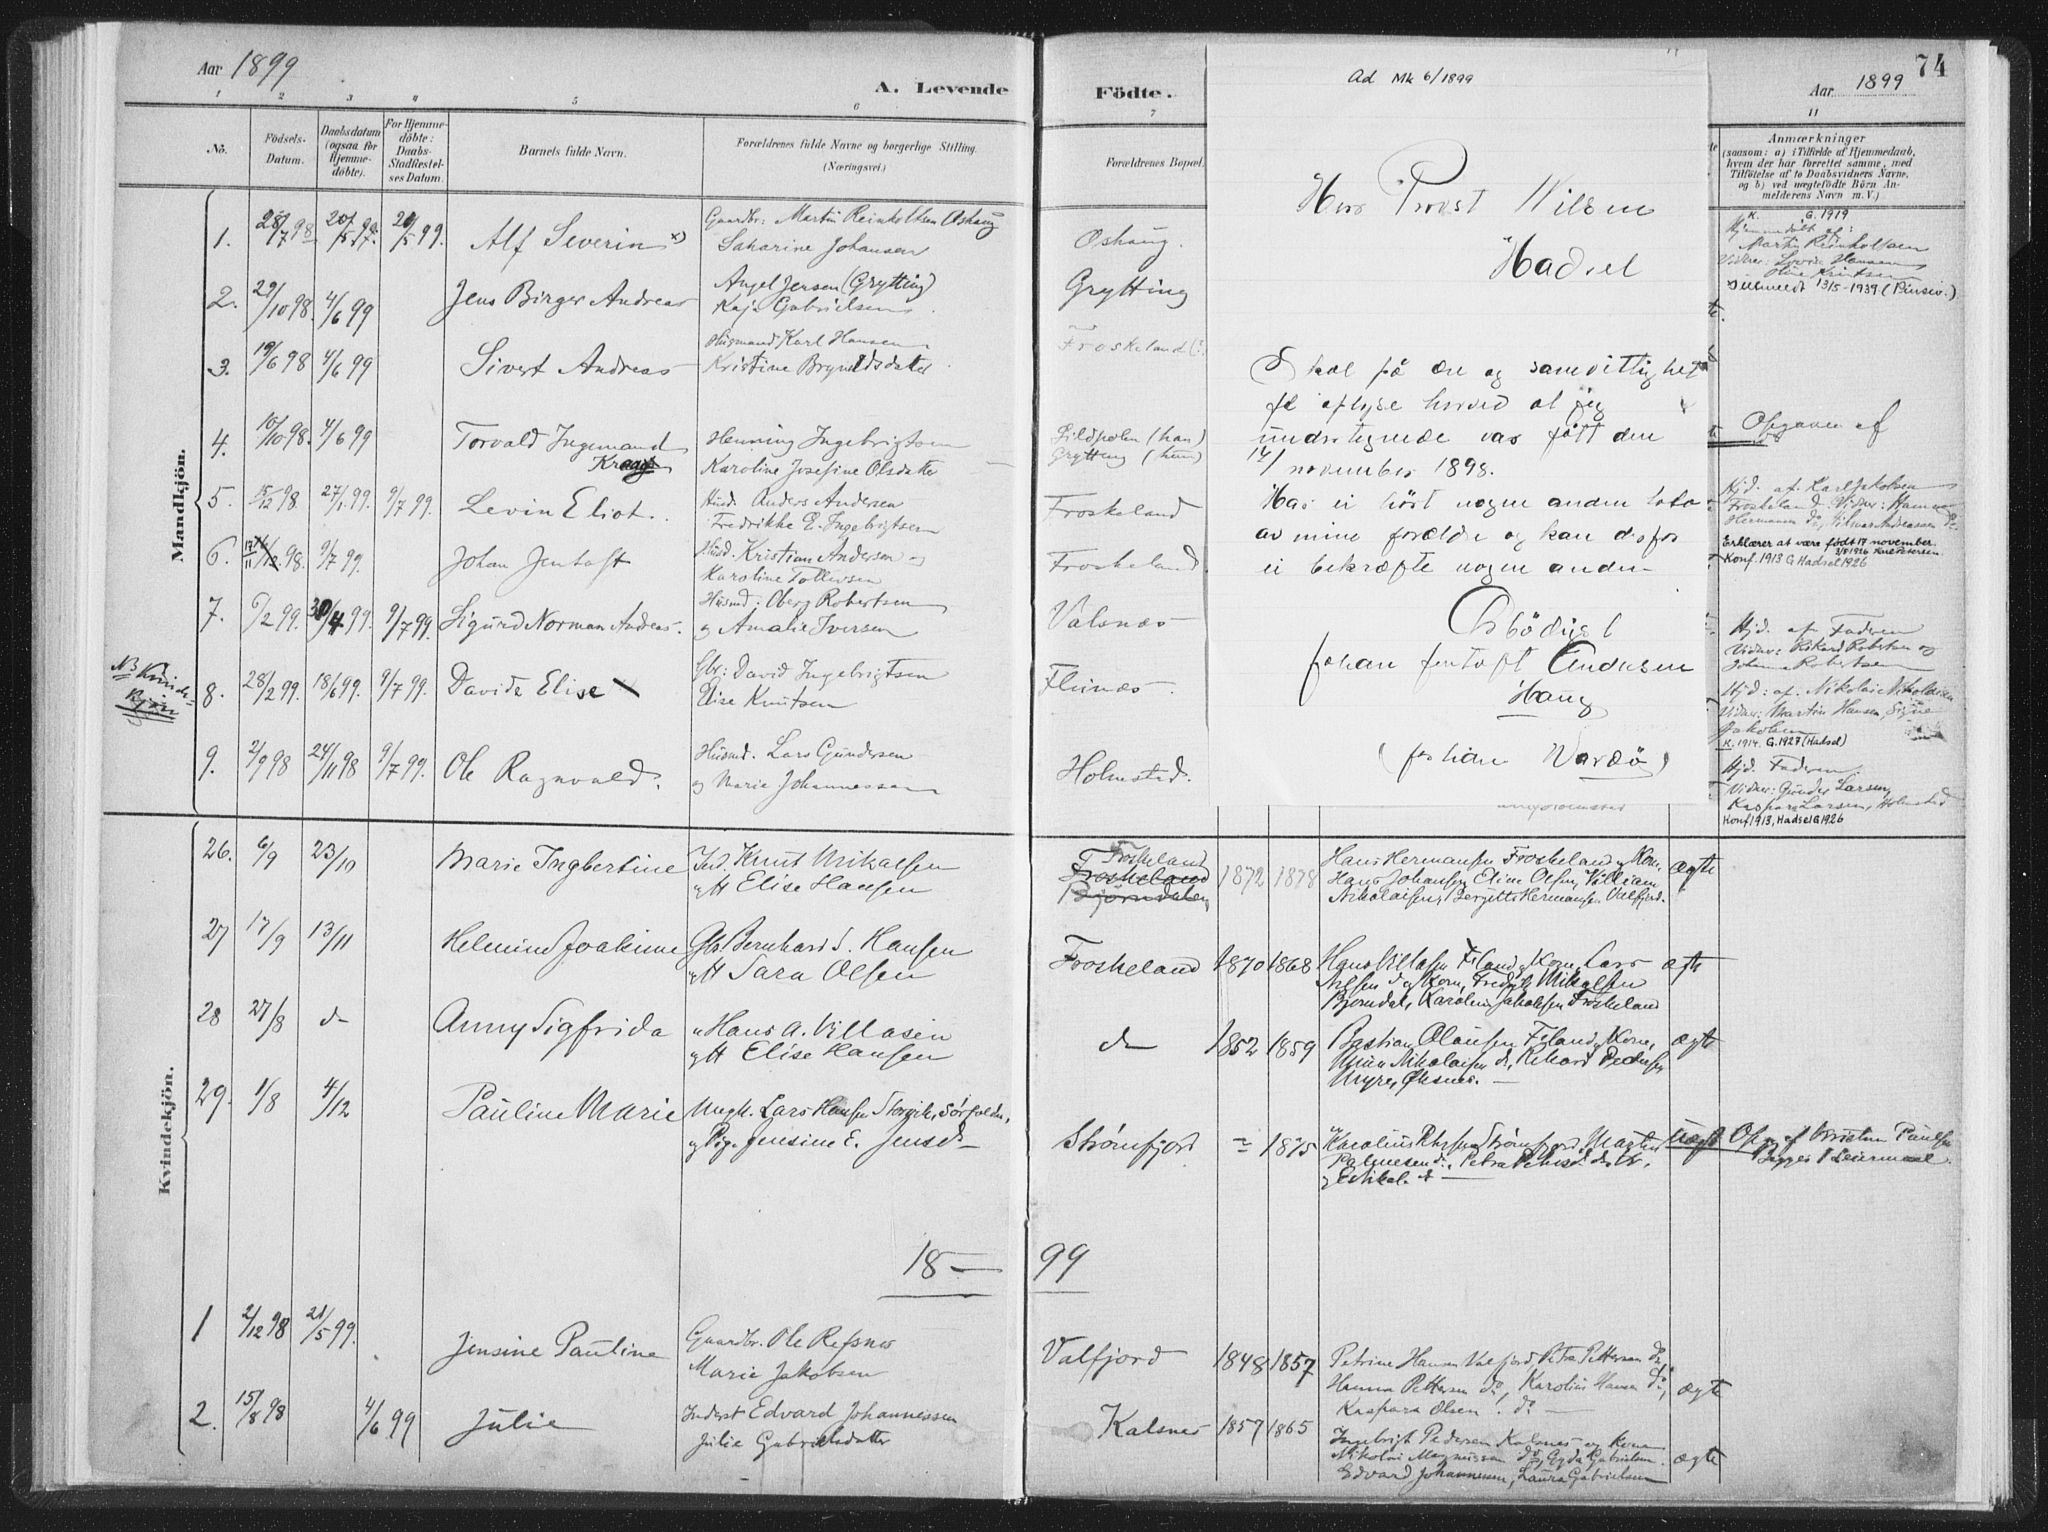 SAT, Ministerialprotokoller, klokkerbøker og fødselsregistre - Nordland, 890/L1286: Ministerialbok nr. 890A01, 1882-1902, s. 74